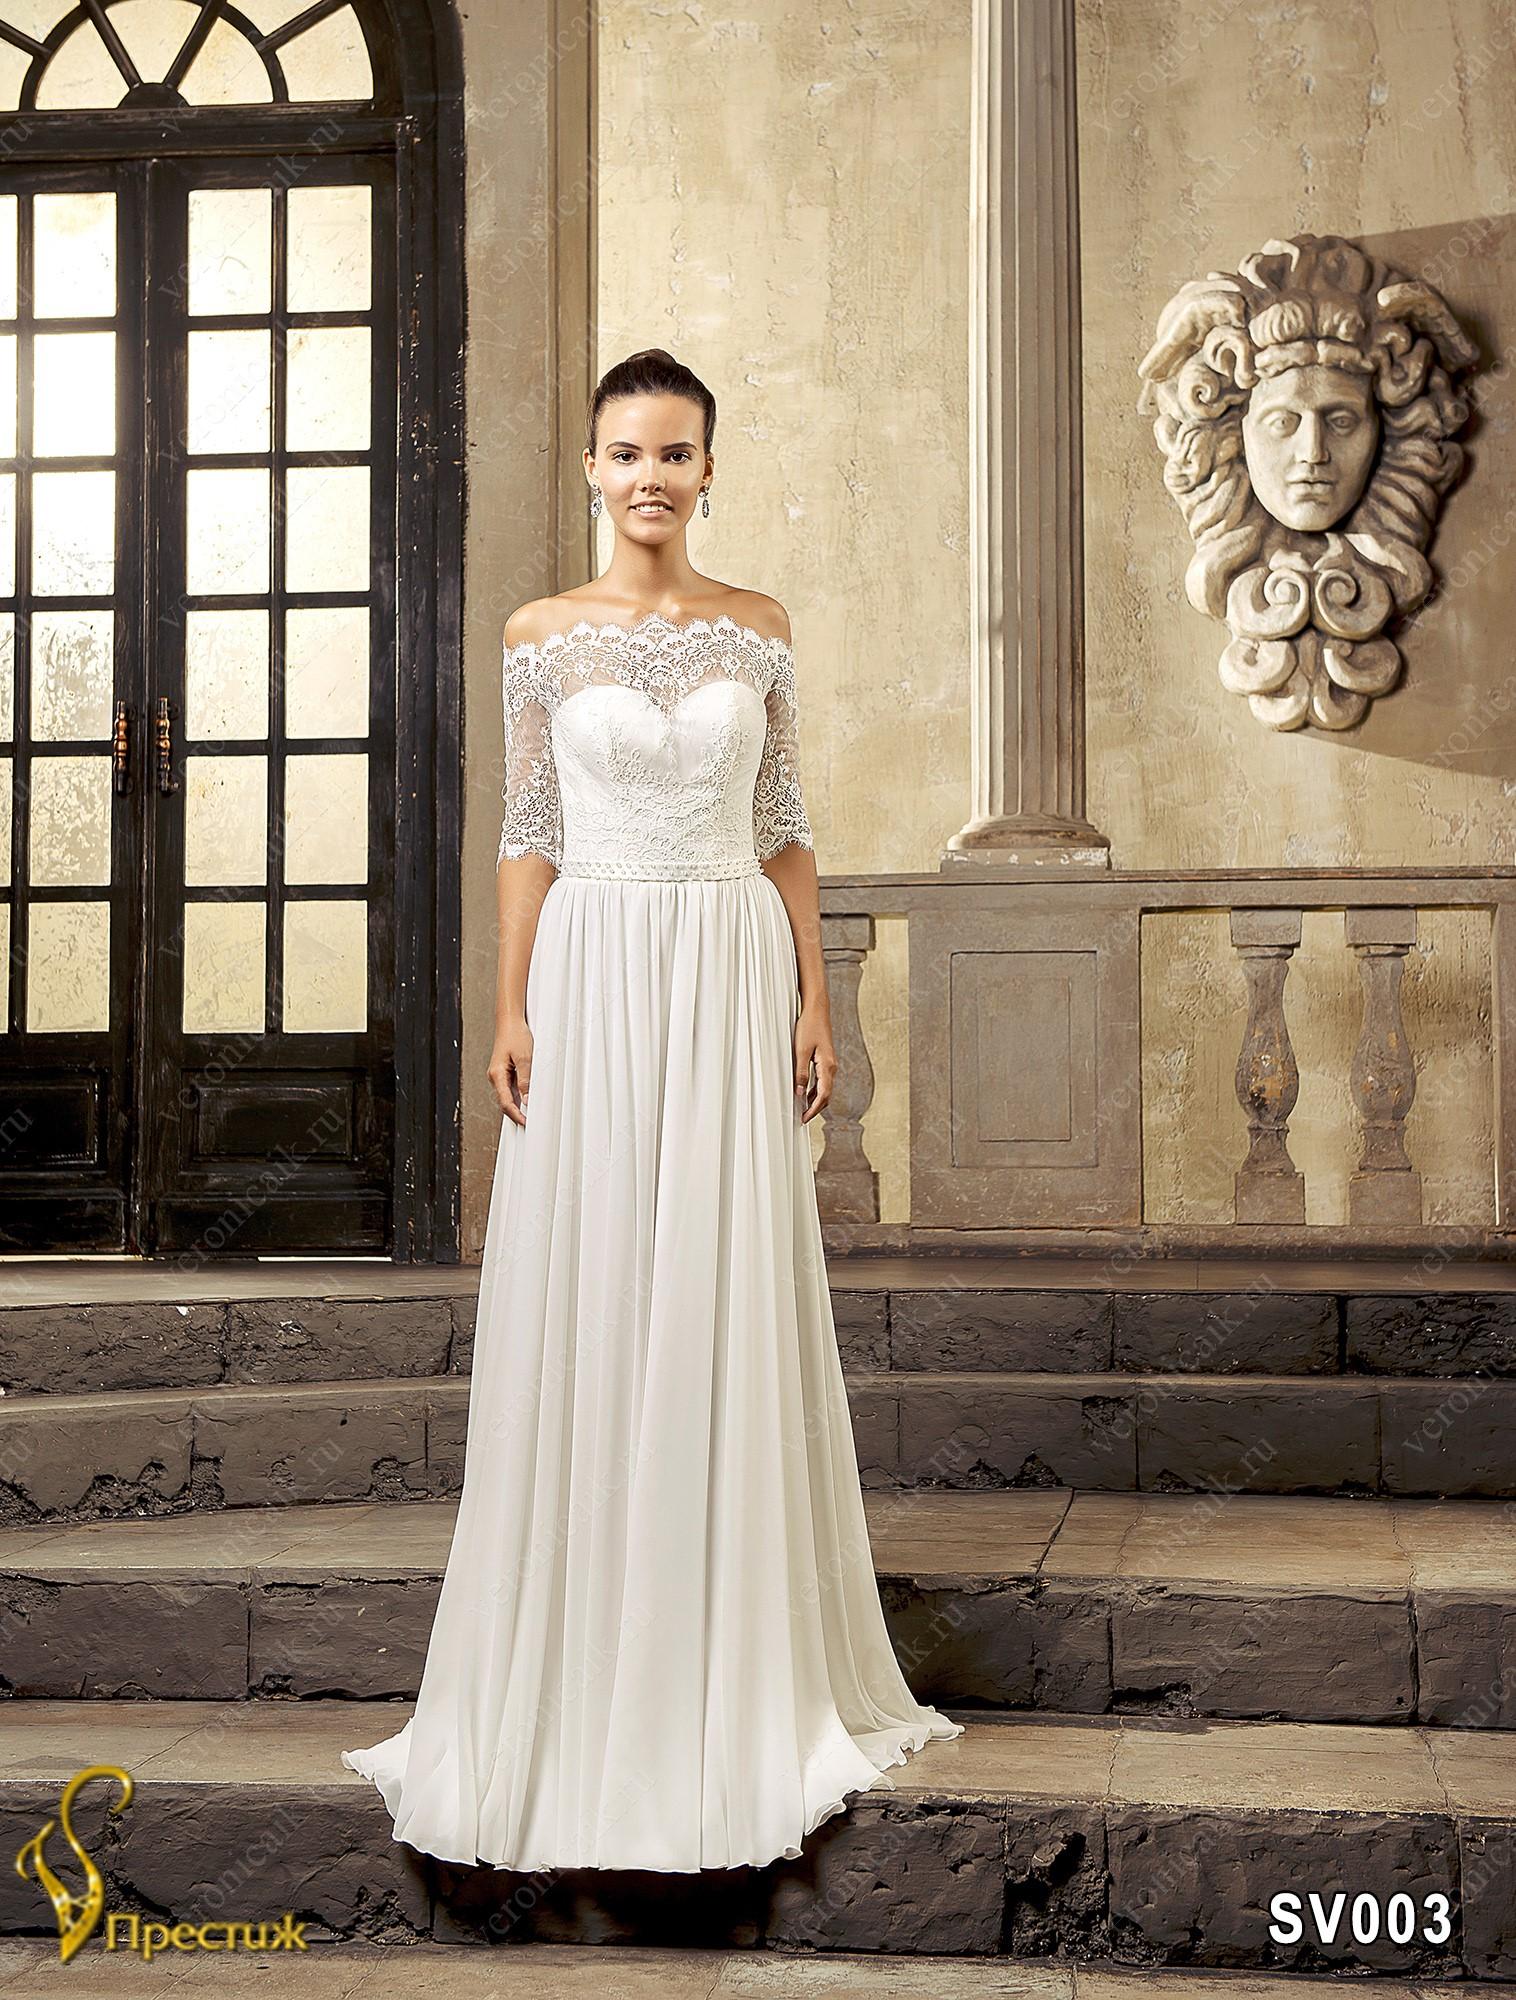 White Dress, свадебный салон в Нижнем Новгороде